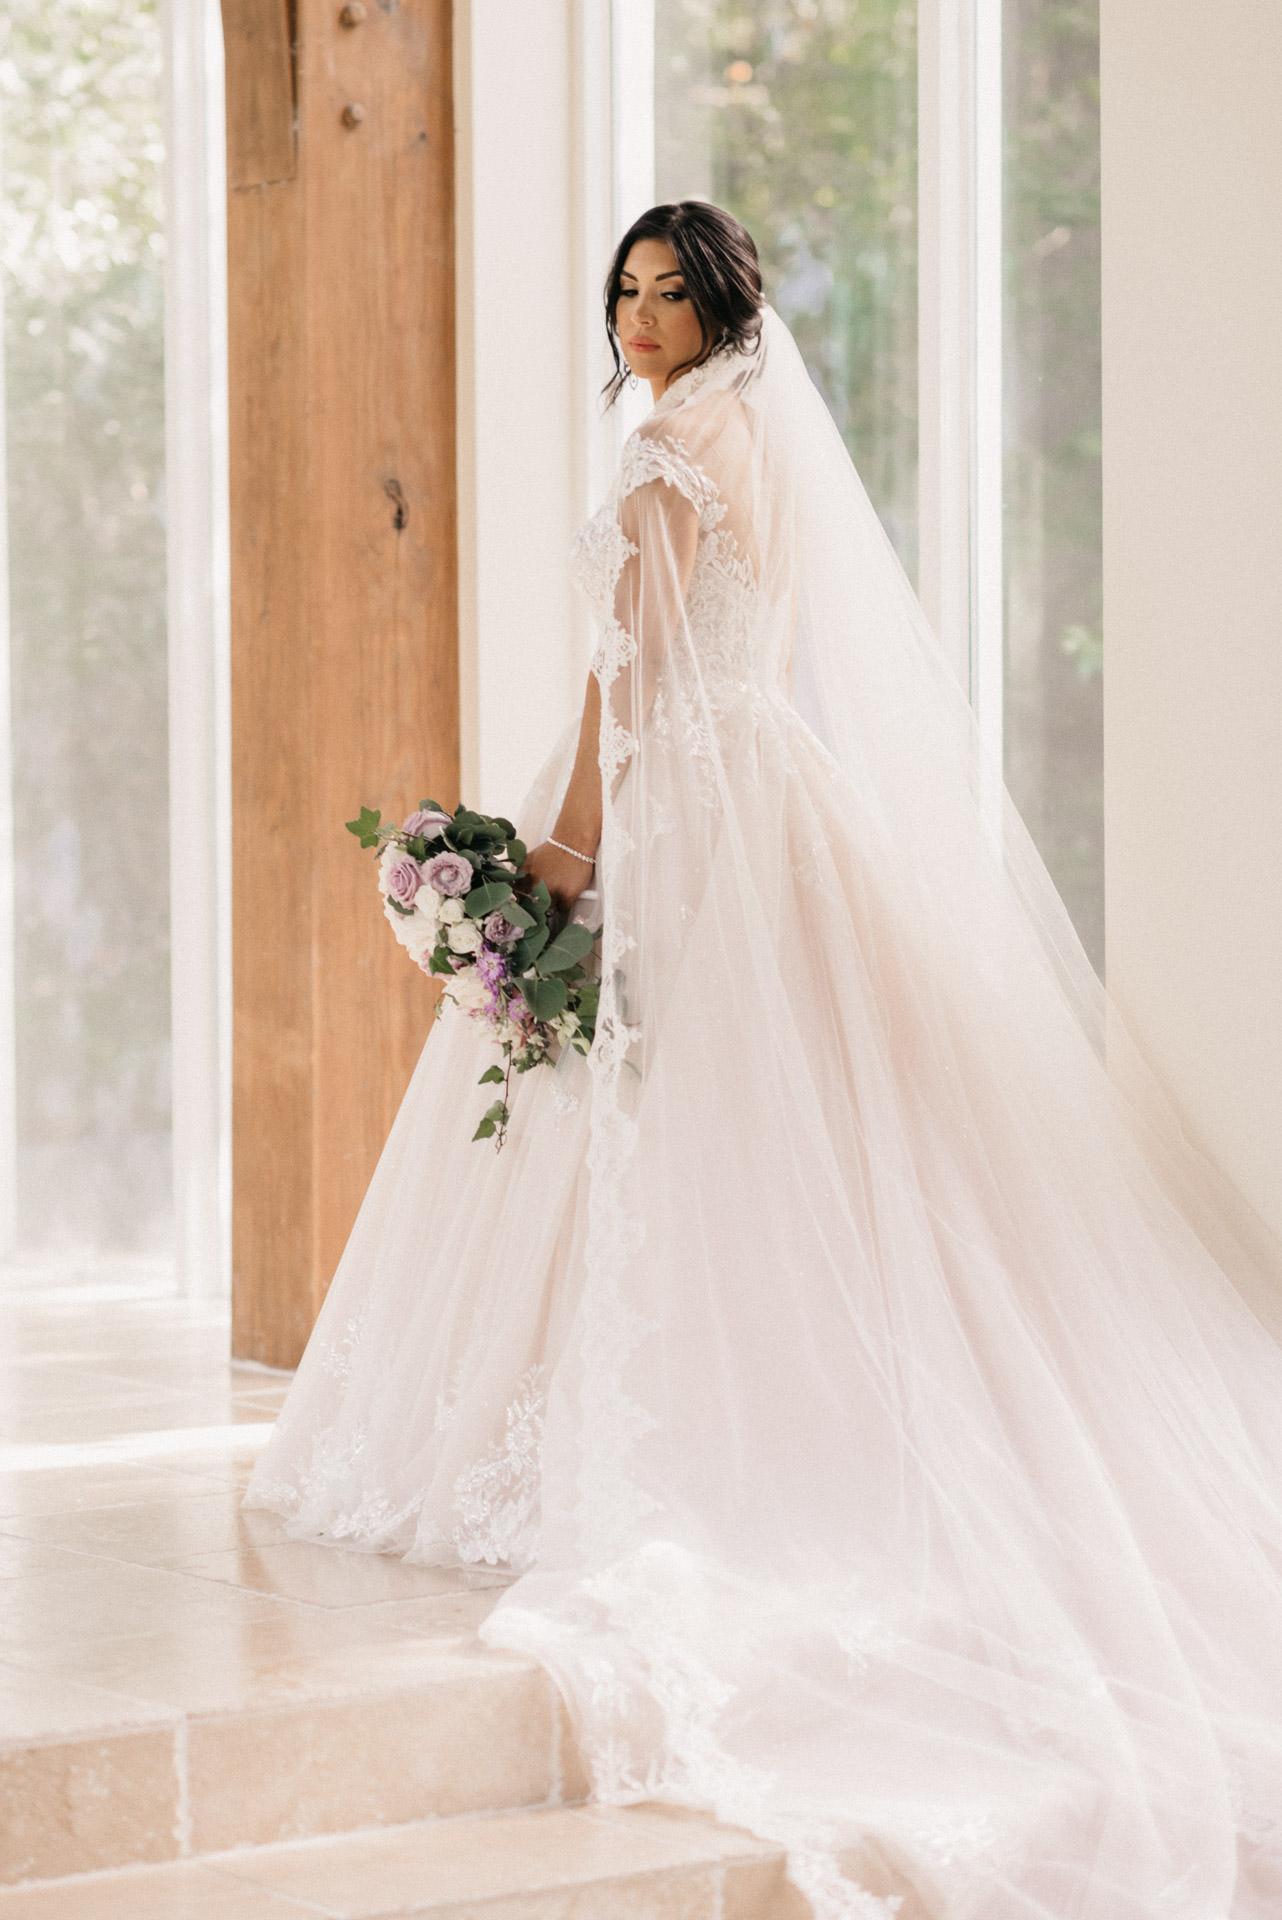 lexi-michael-wedding-blog-sm-79.jpg